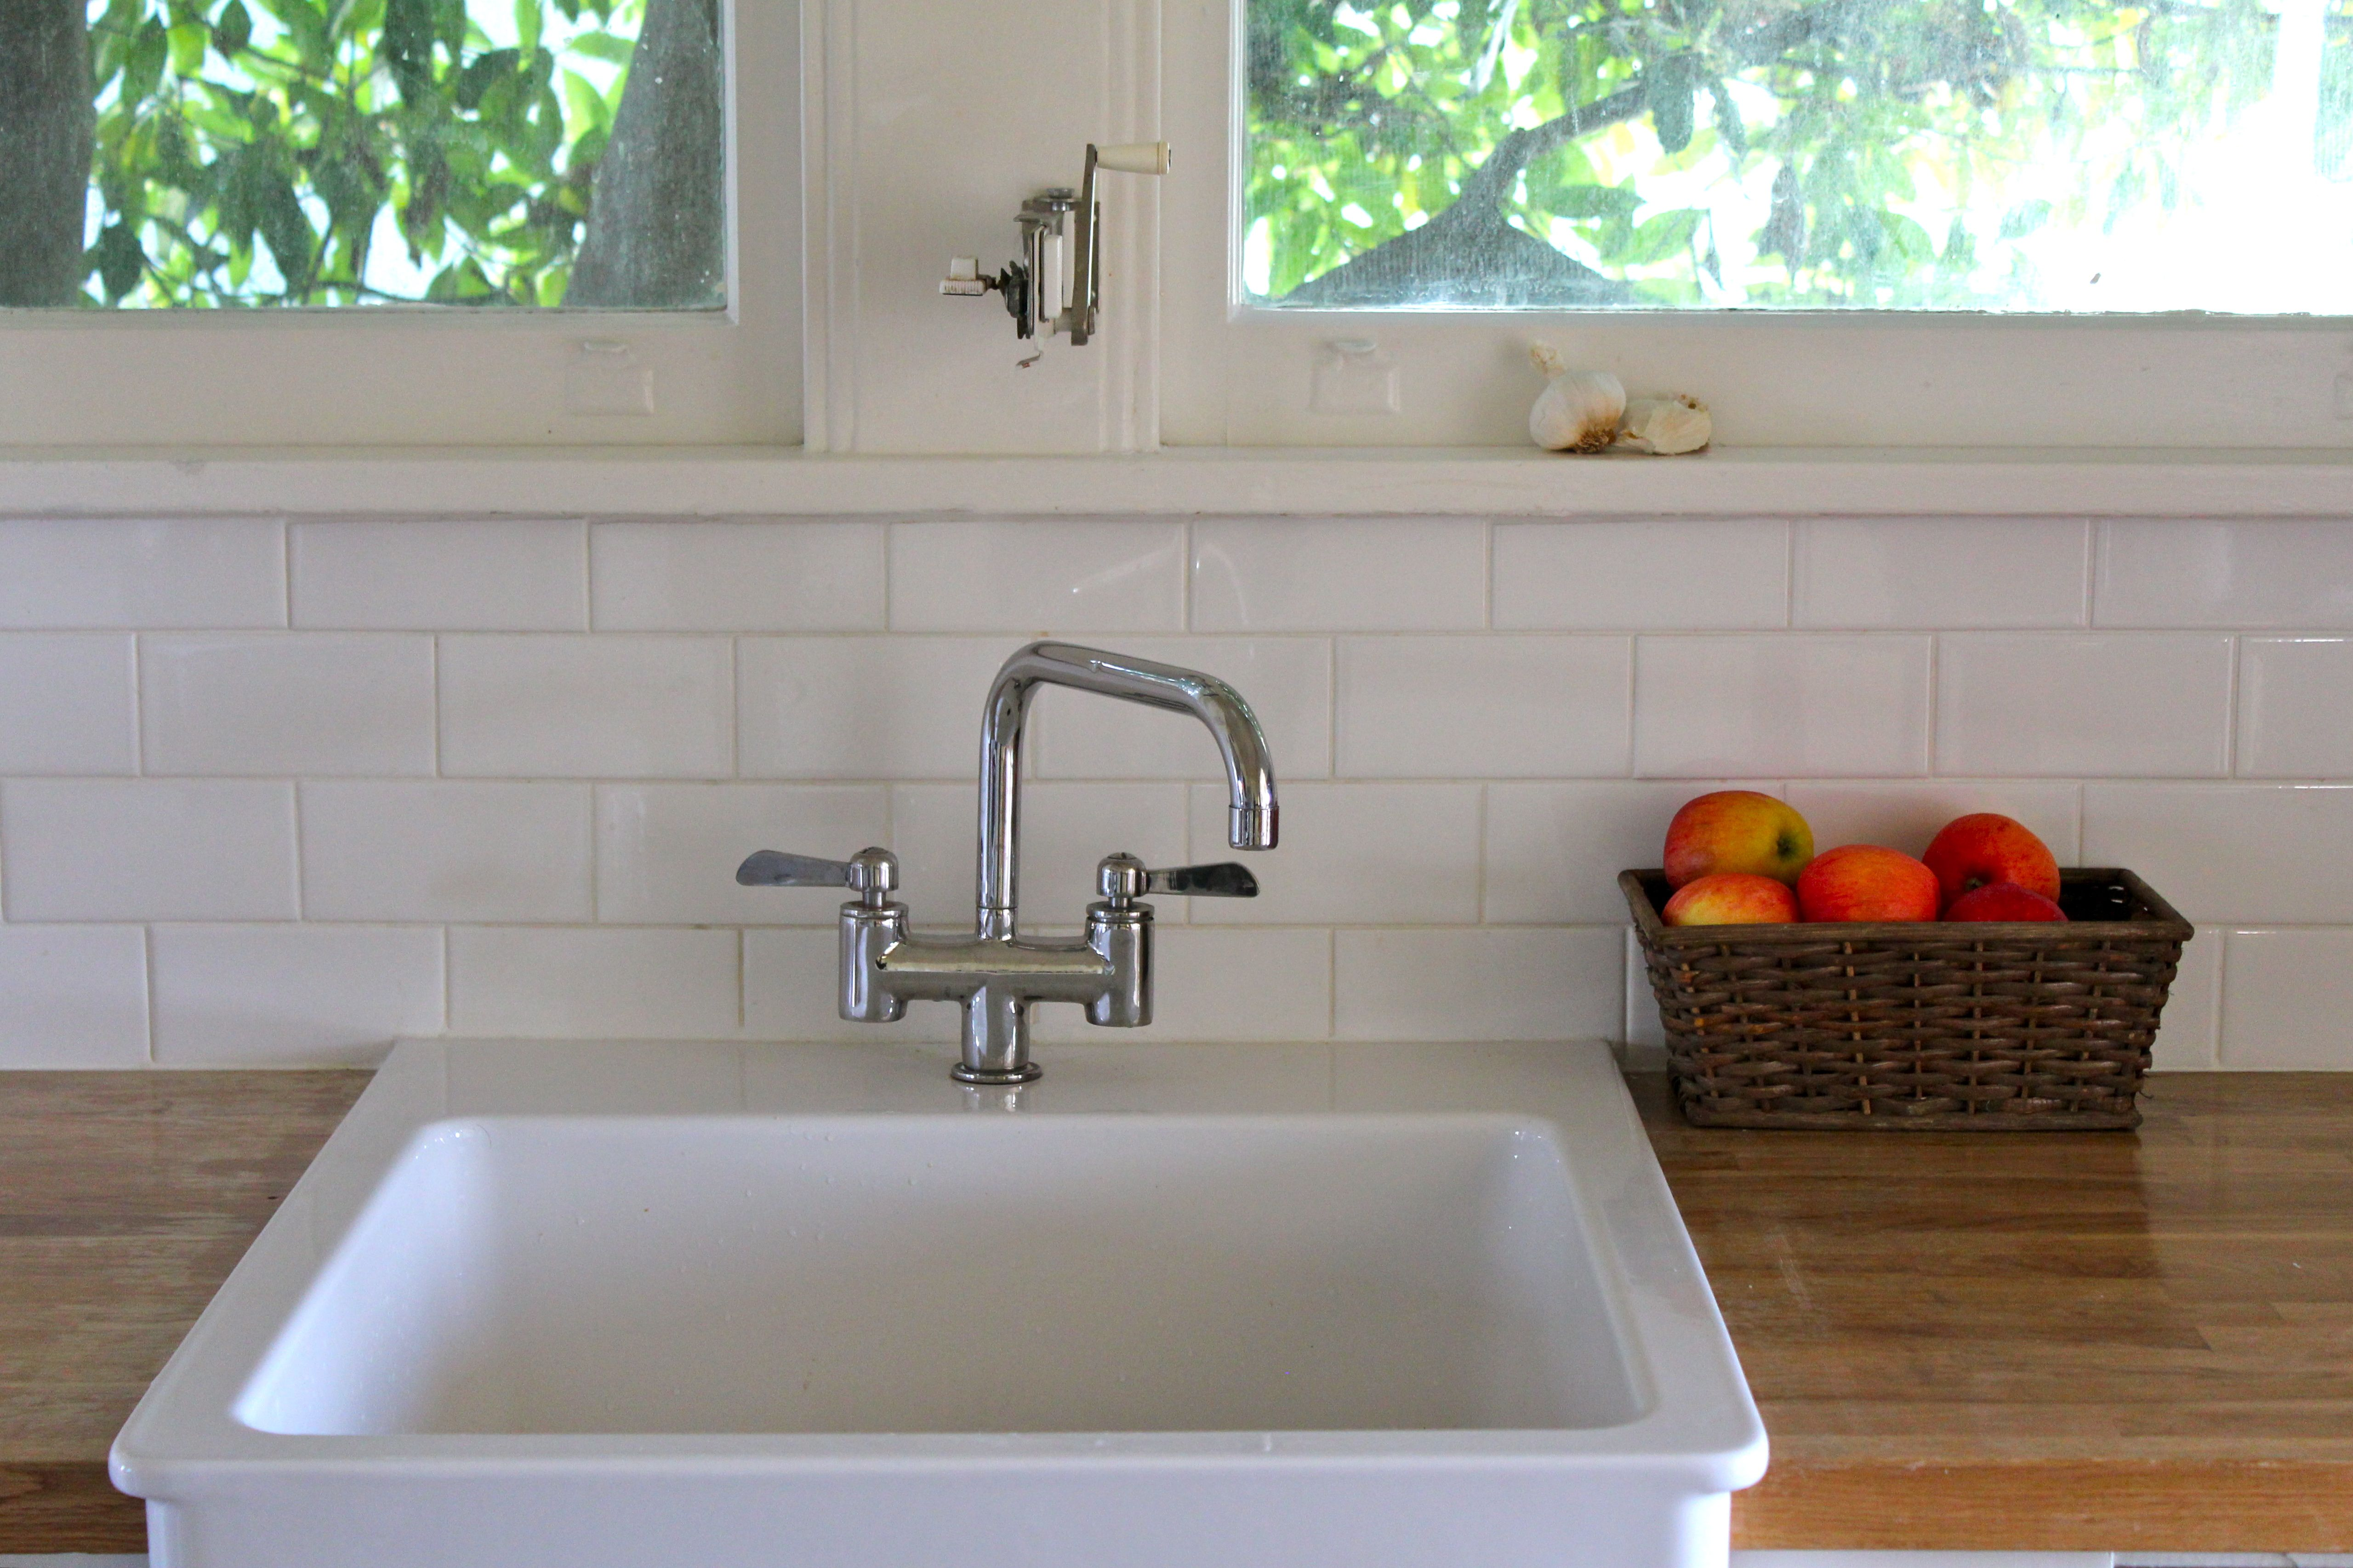 Subway Tile Backsplash Butcher S Block Counter And A Front Sink Le